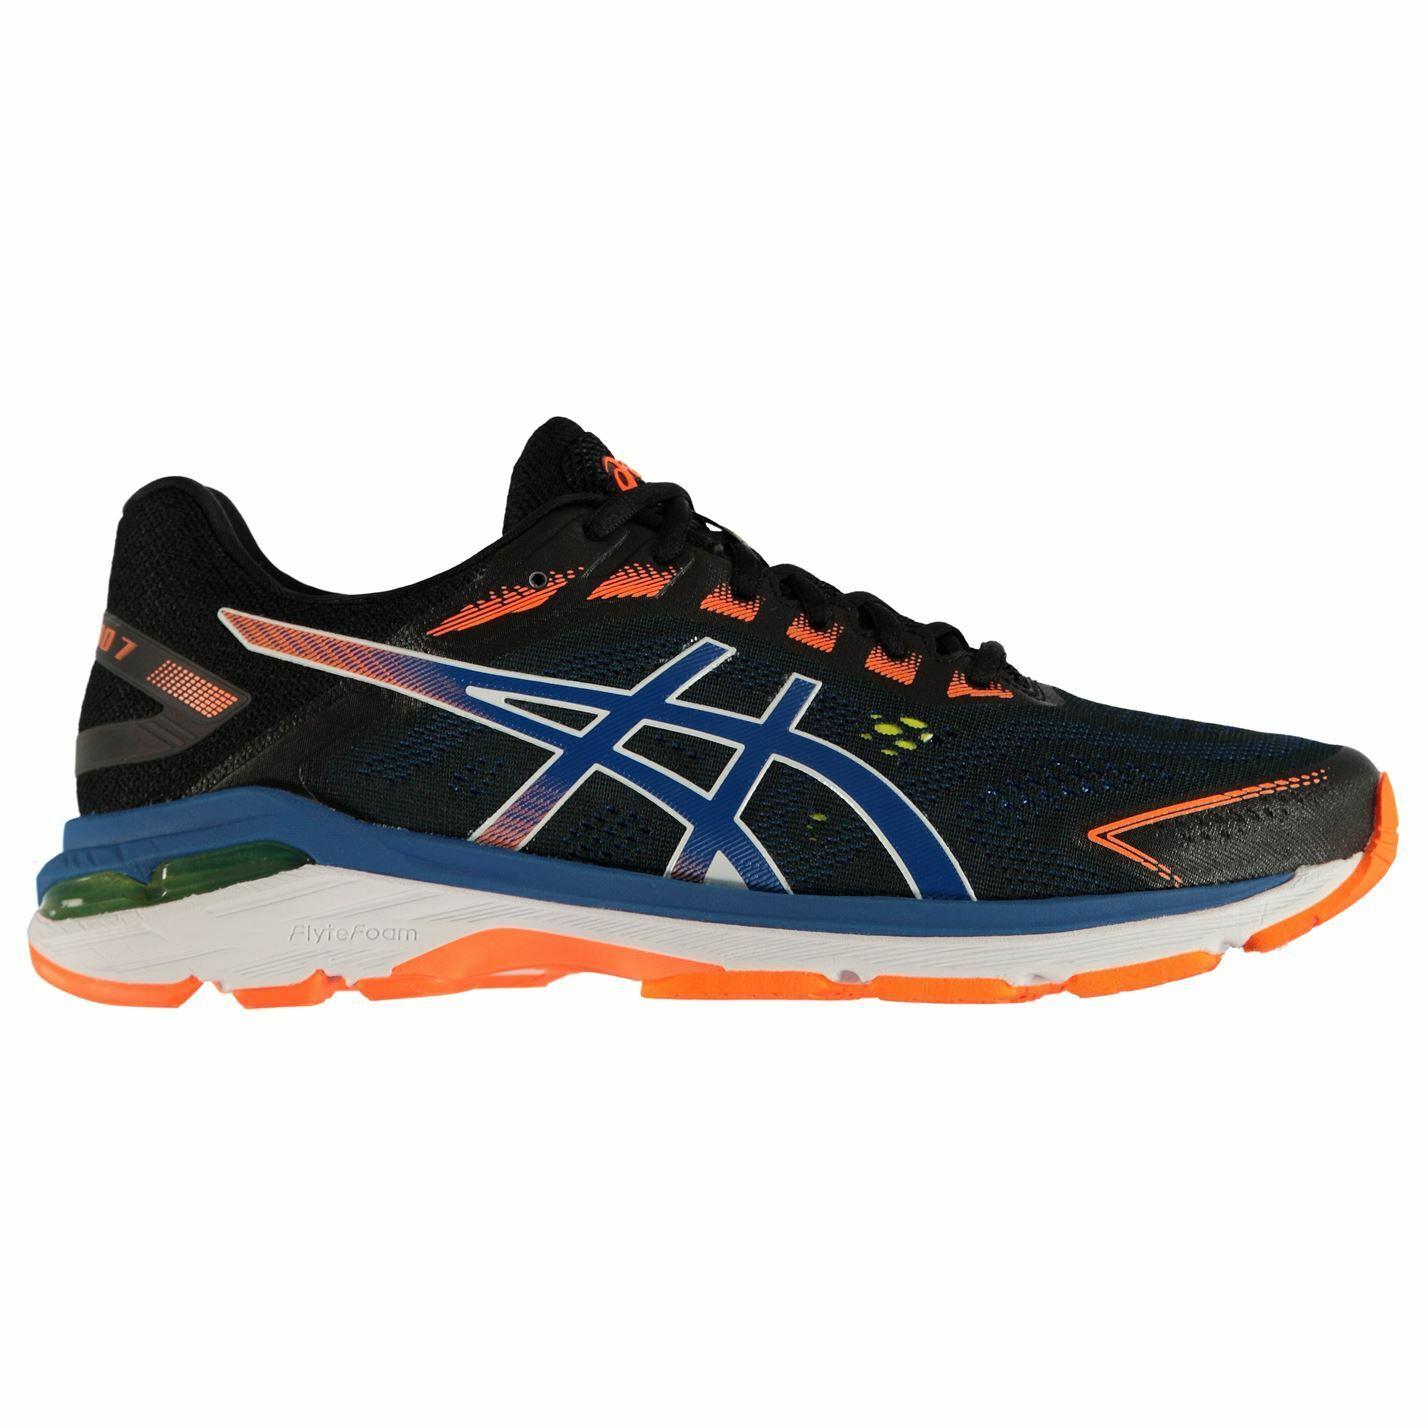 Asics Mens GT 2000 7 AP Road Running shoes